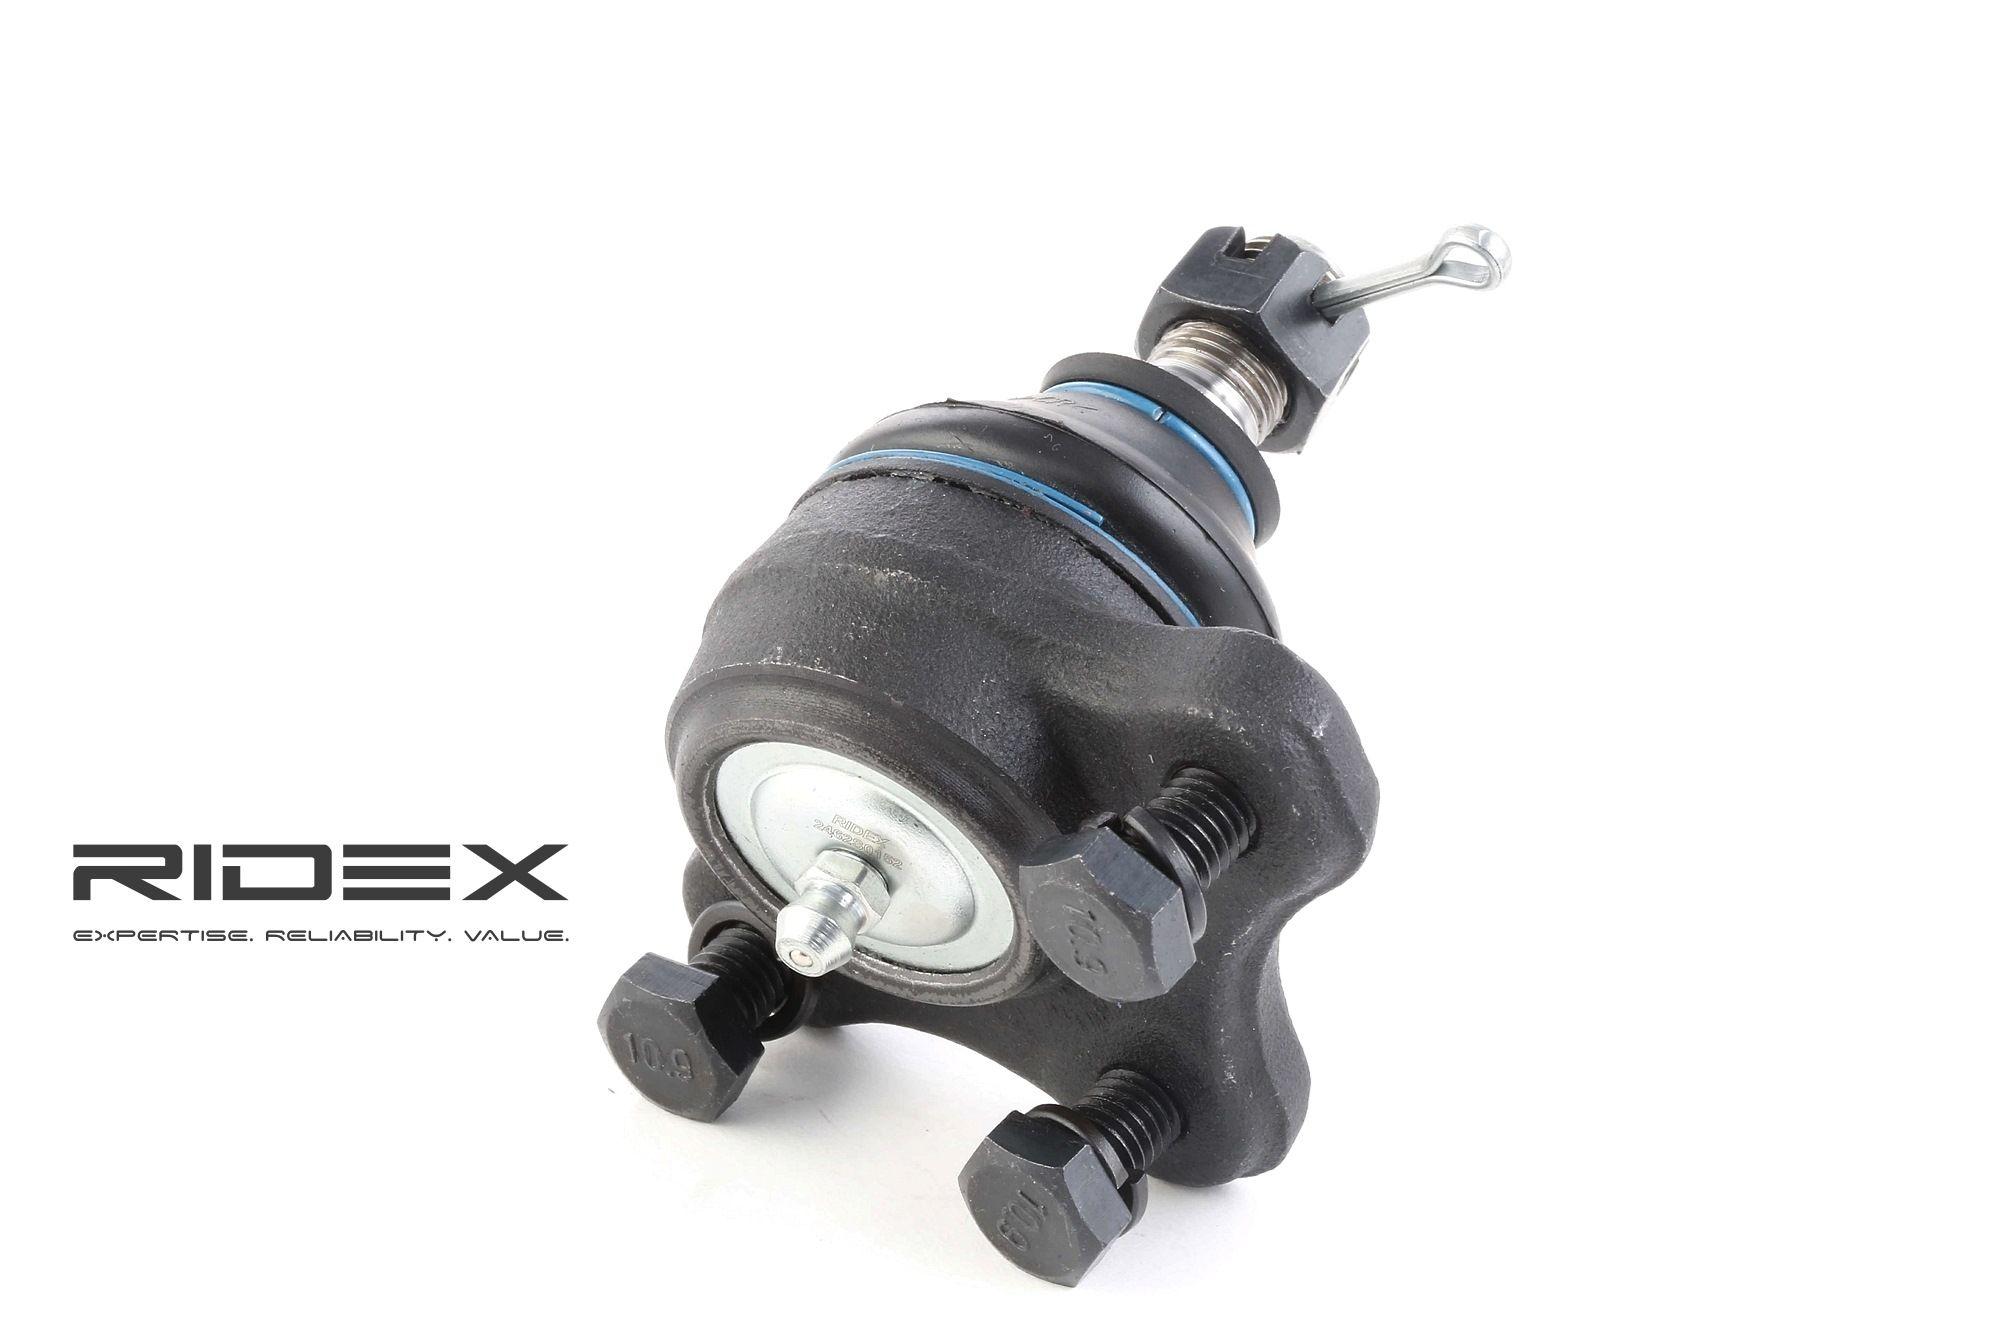 RIDEX: Original Lenkungsteile 2462S0152 (Konusmaß: 15mm, Gewindemaß: M12x1.25)